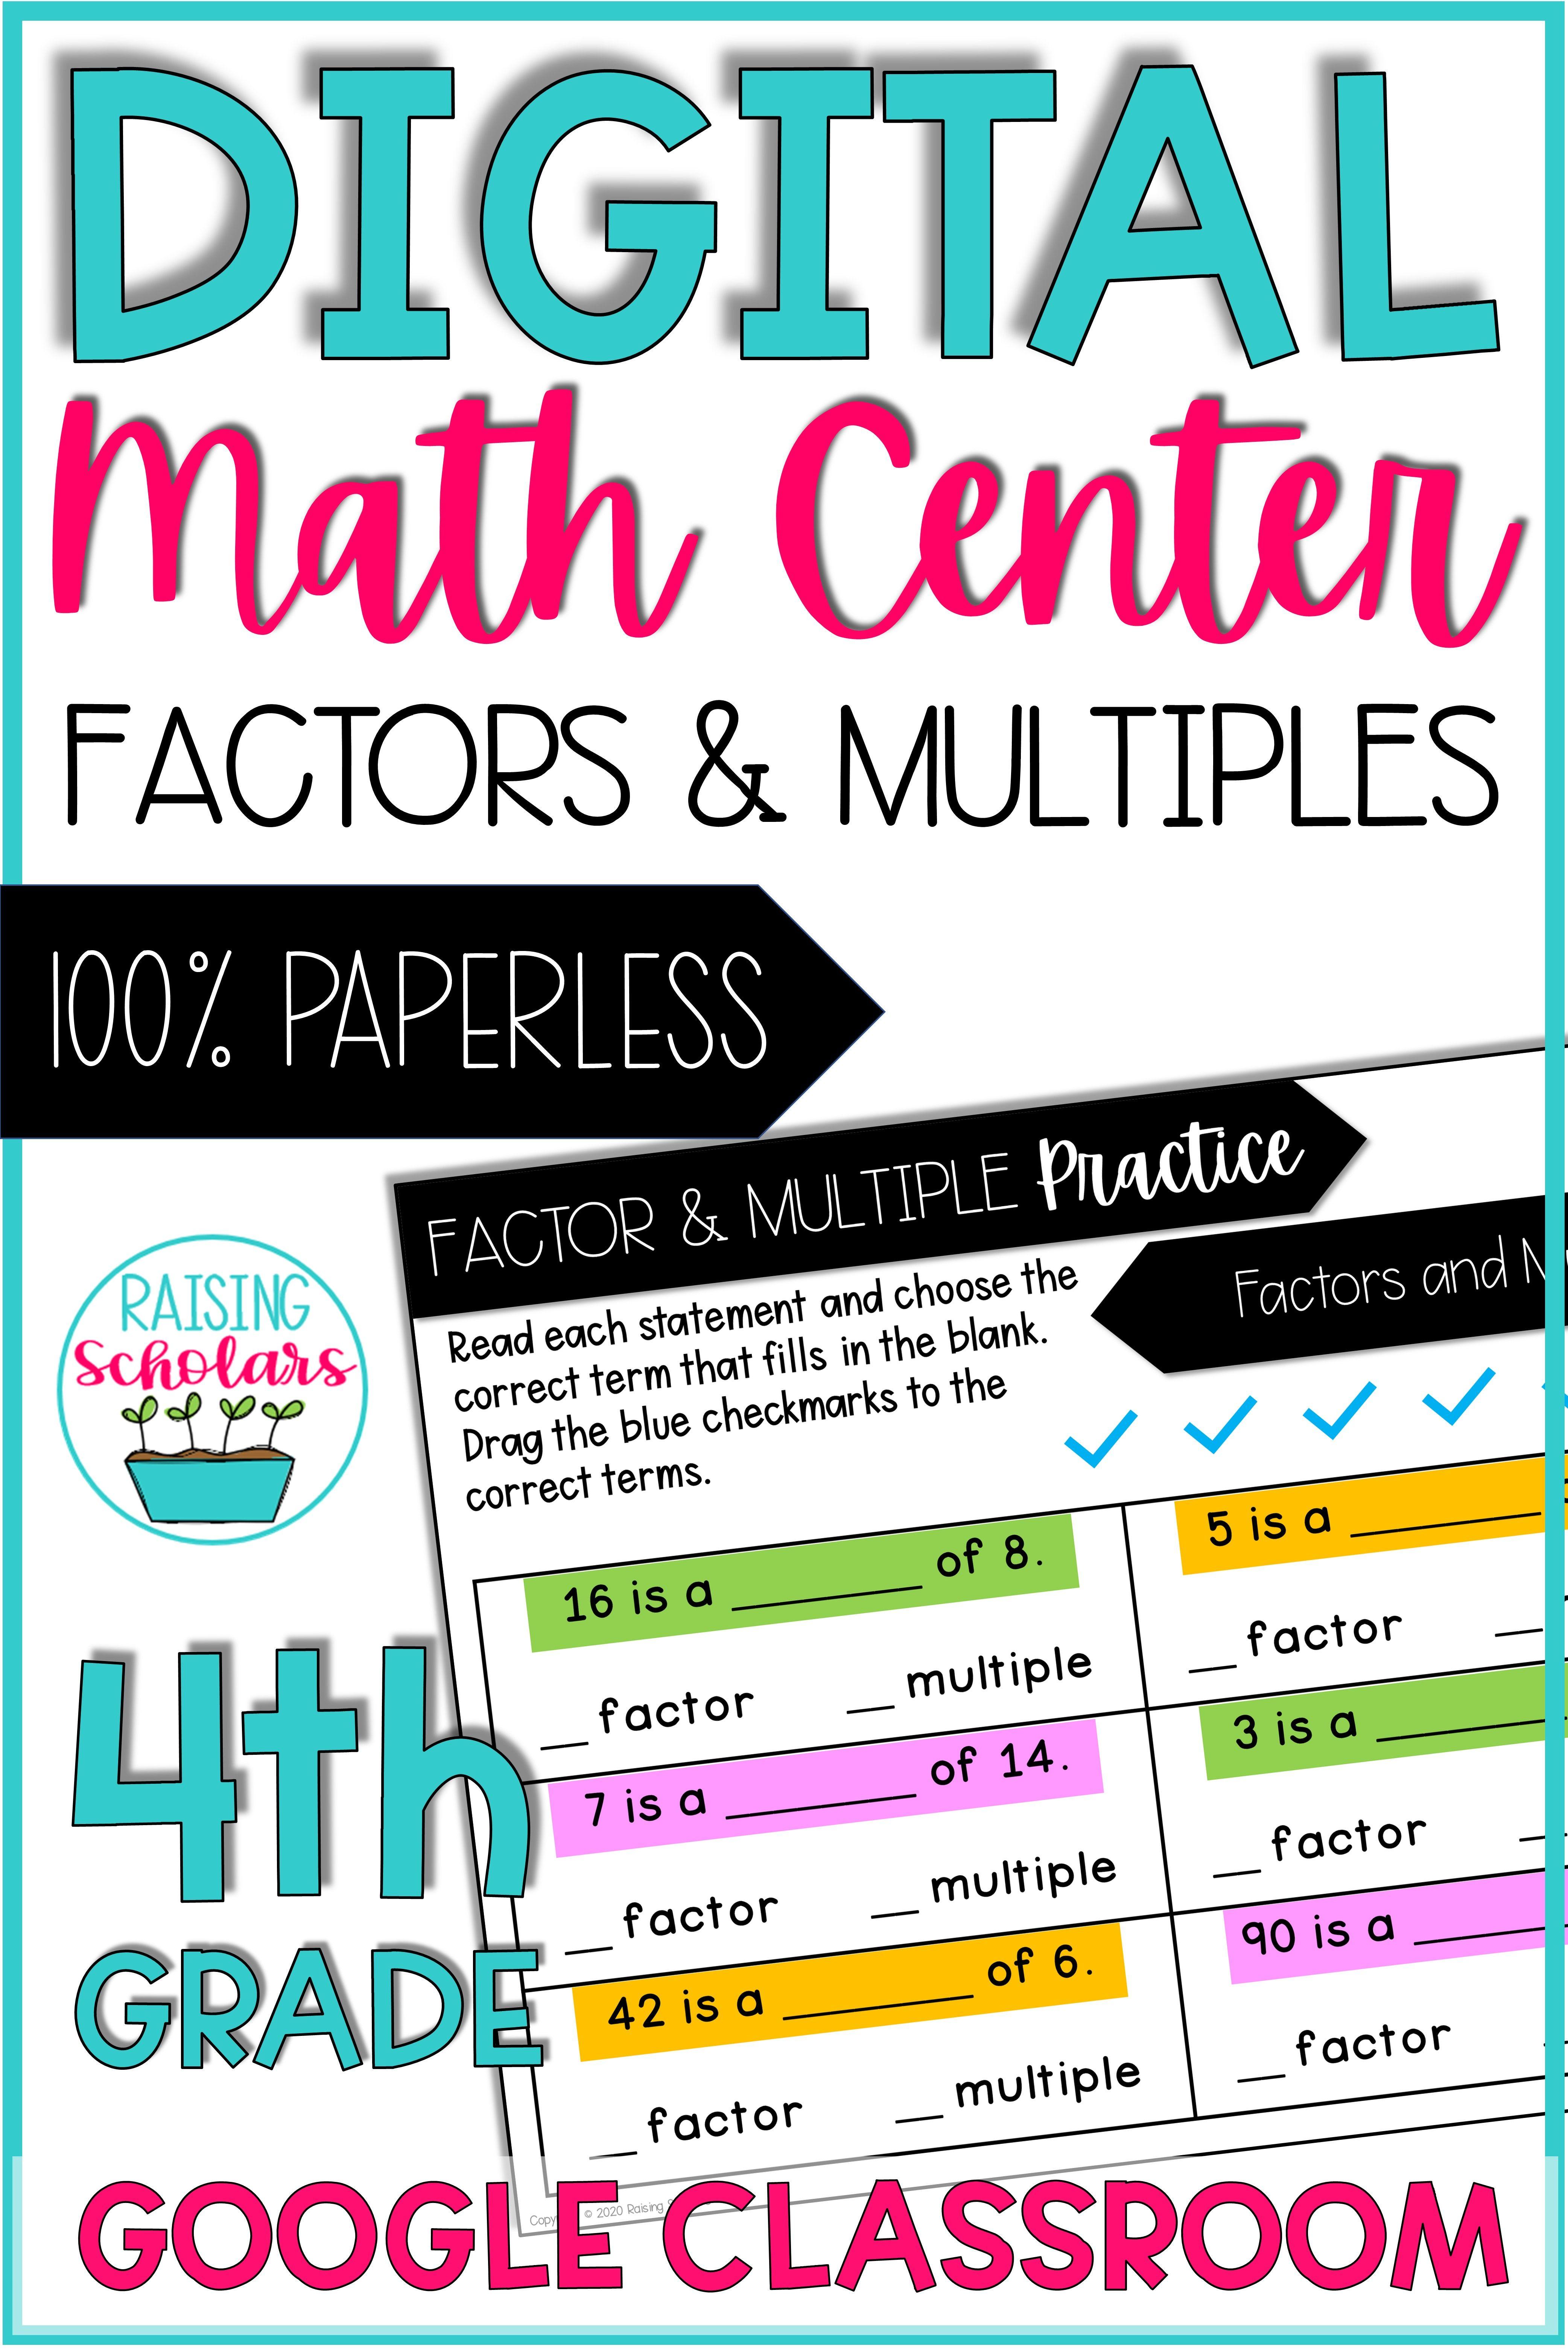 Digital Math Center 4th Factors Amp Multiples